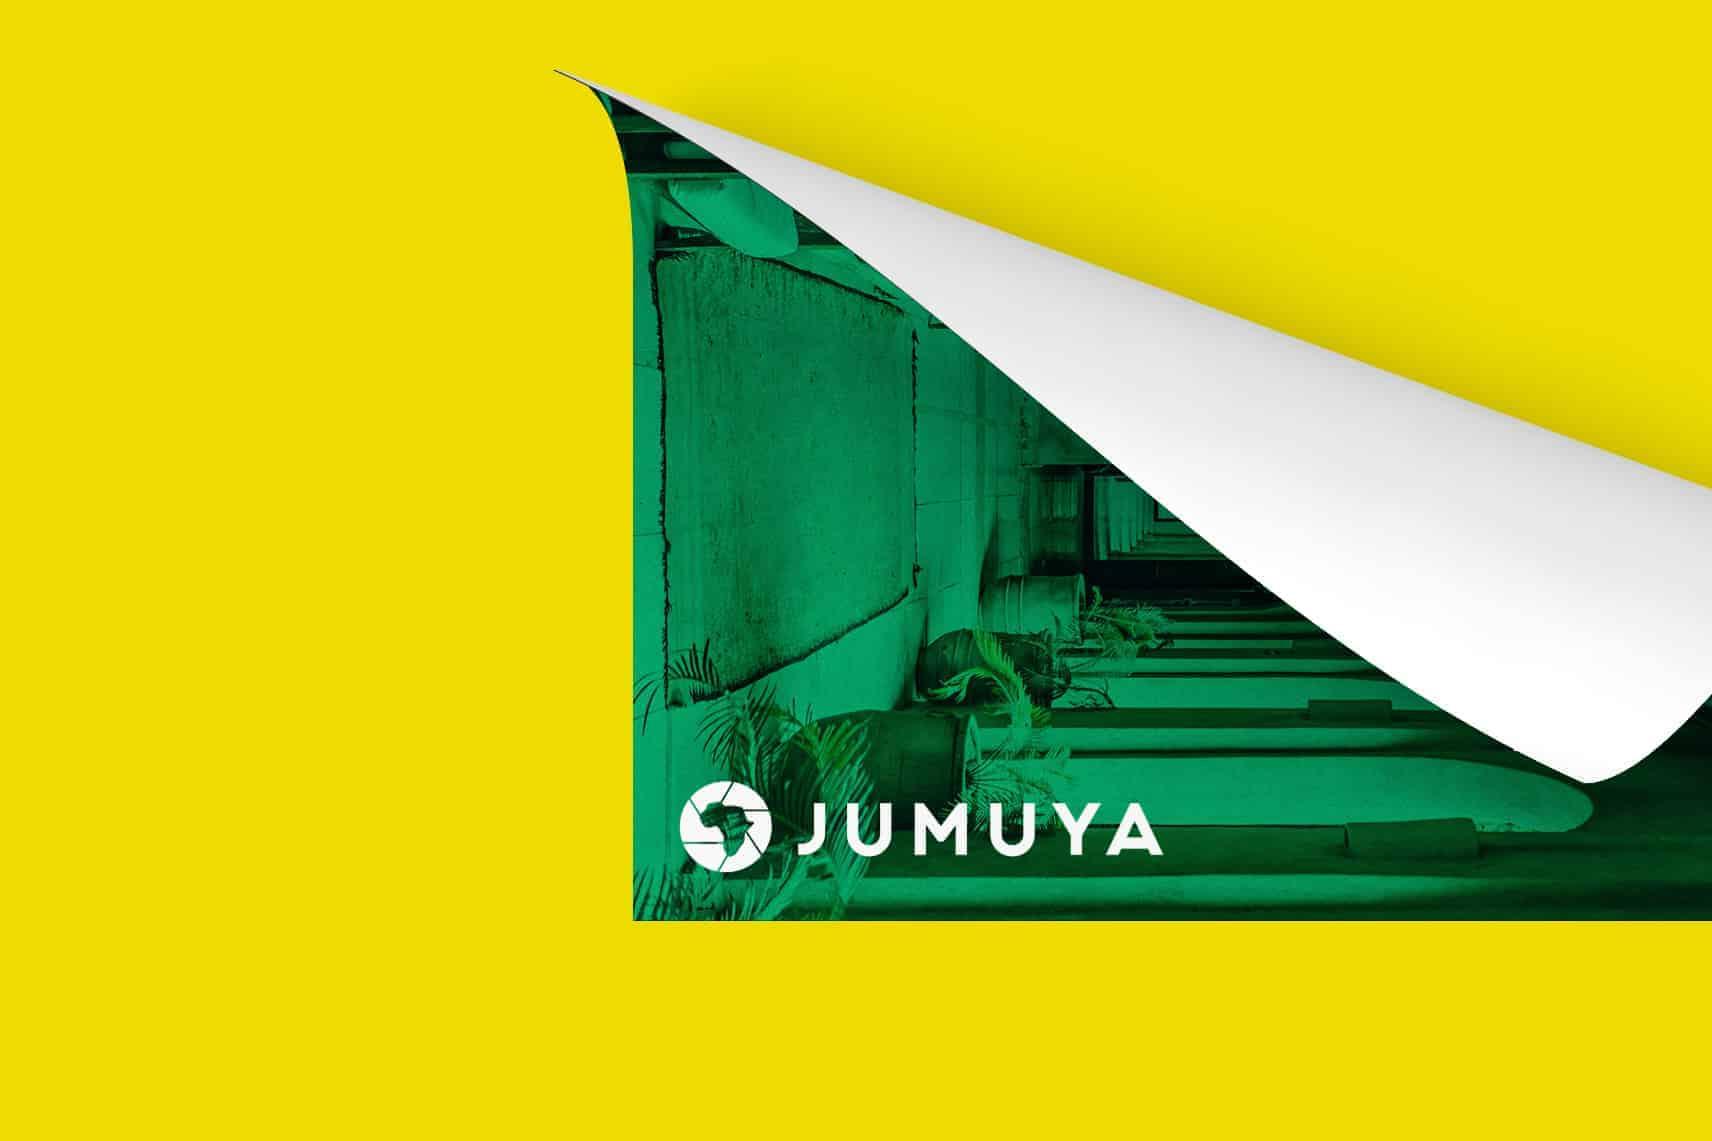 Jumuya